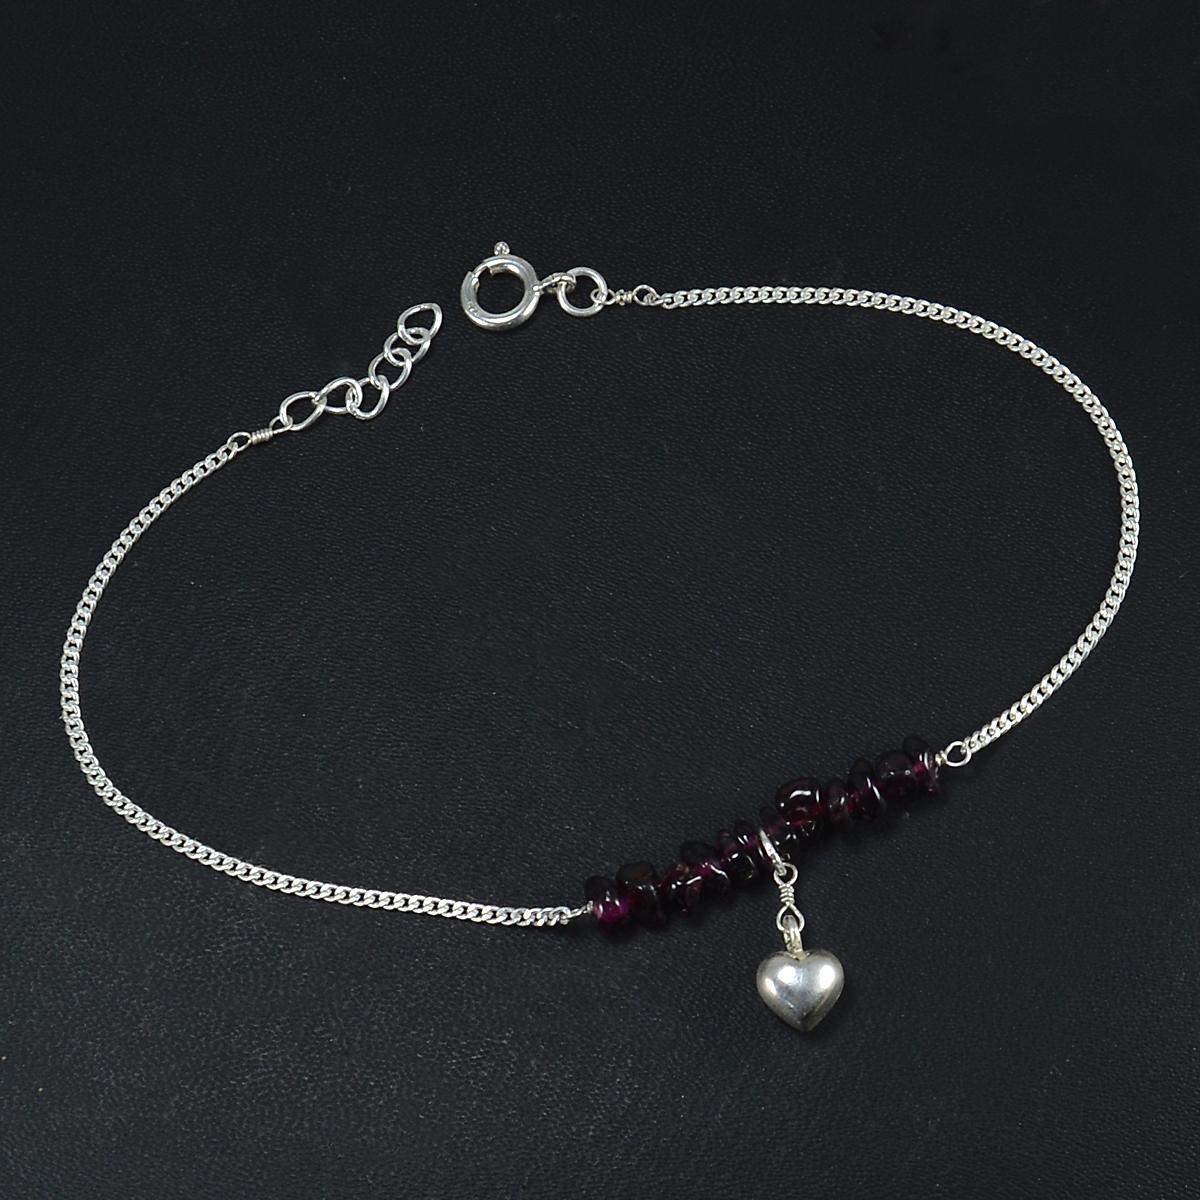 Handmade Jewelry Manufacturer Garnet Gemstone 925 Sterling Silver Single Piece Anklet Jaipur Rajasthan India